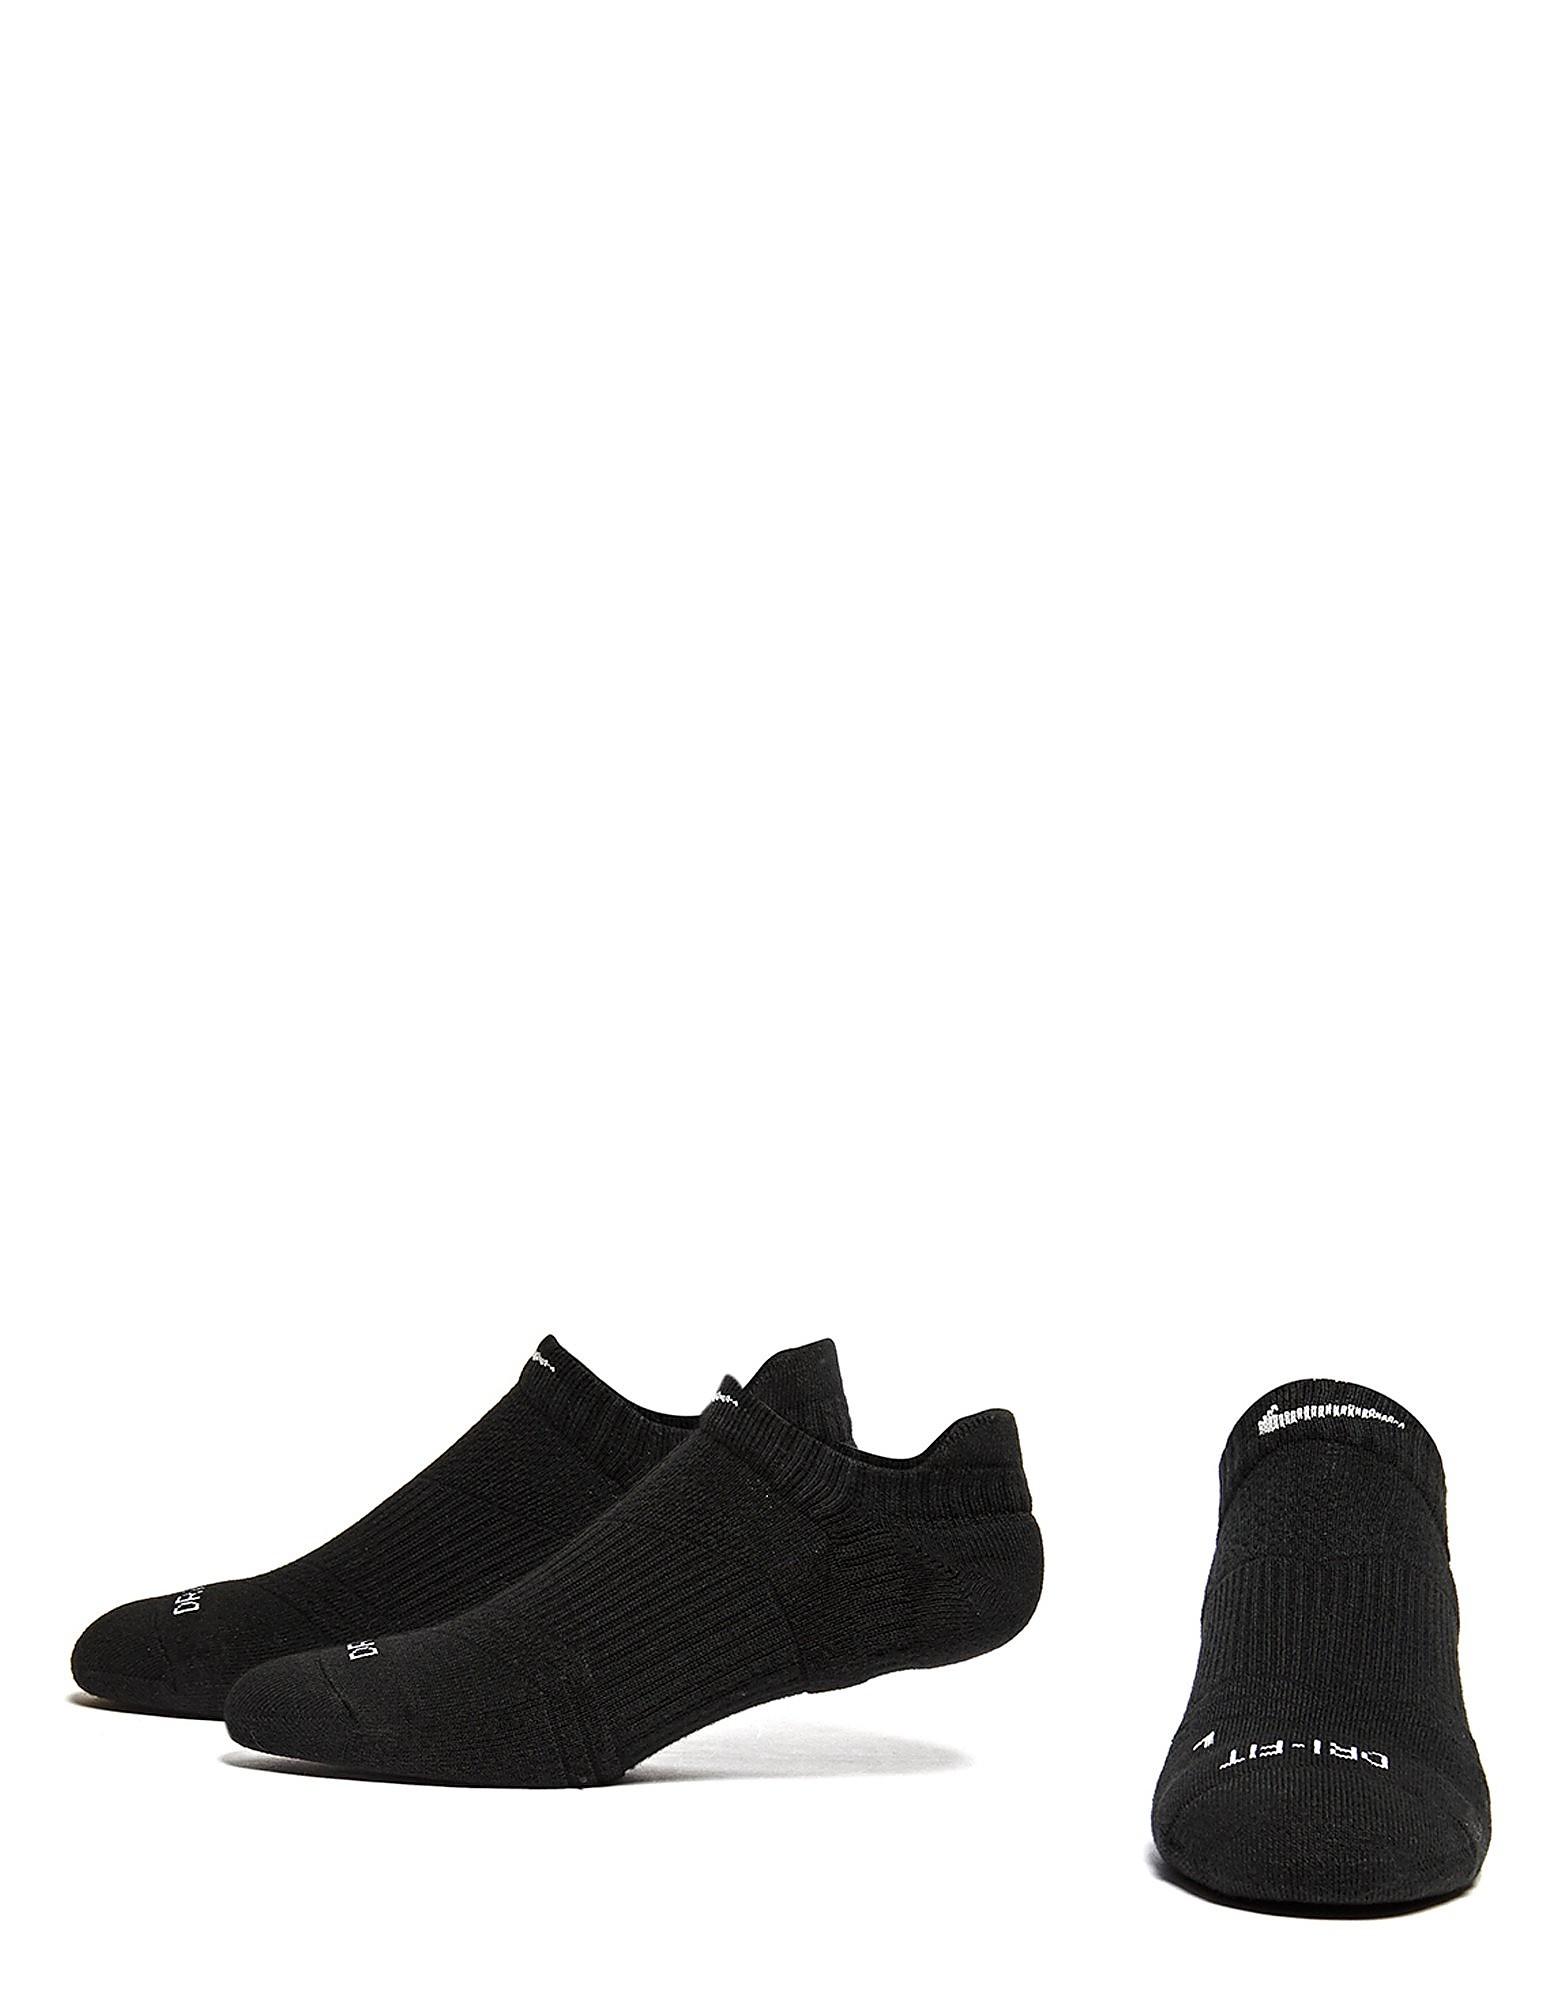 Nike 3-pak Dri-FIT usynlige sokker